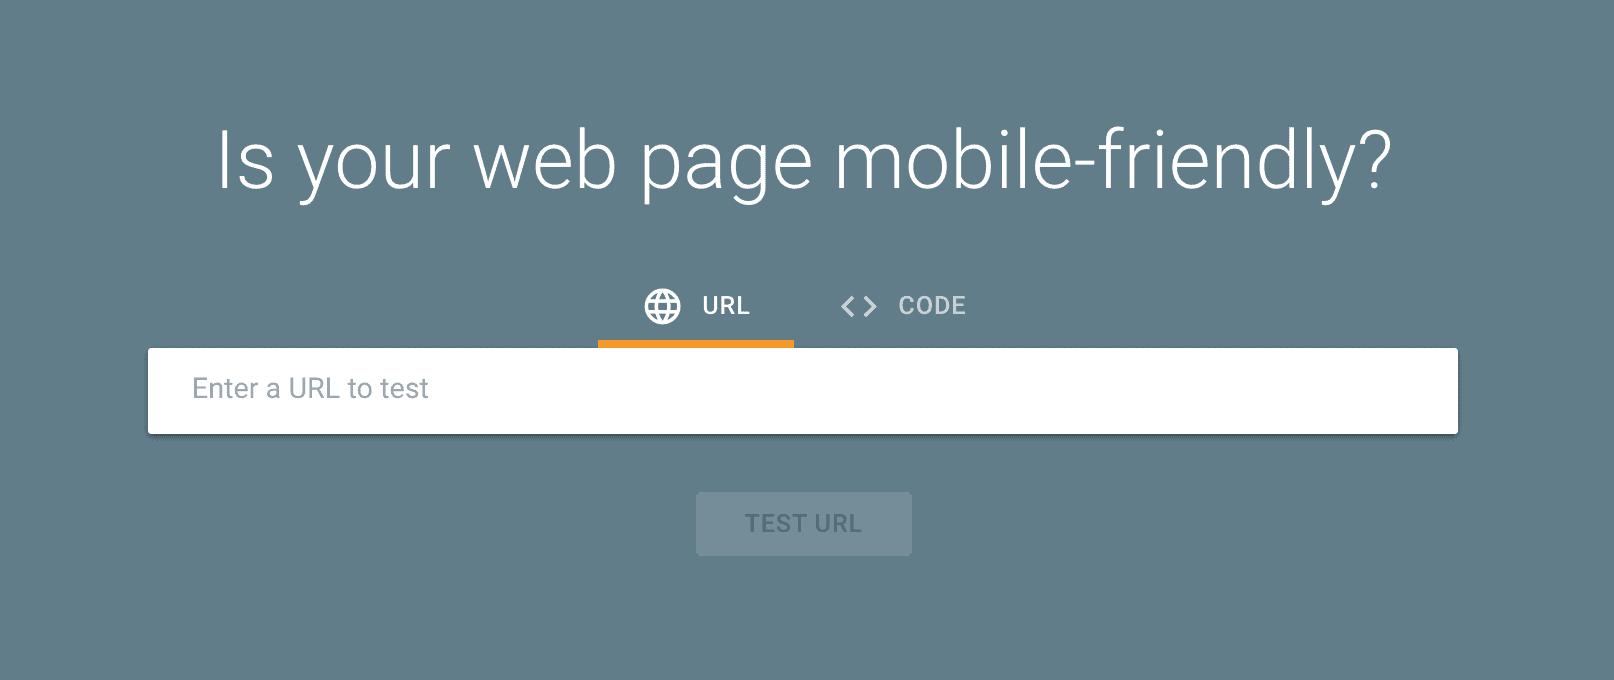 A screenshot of Google's free mobile testing tool